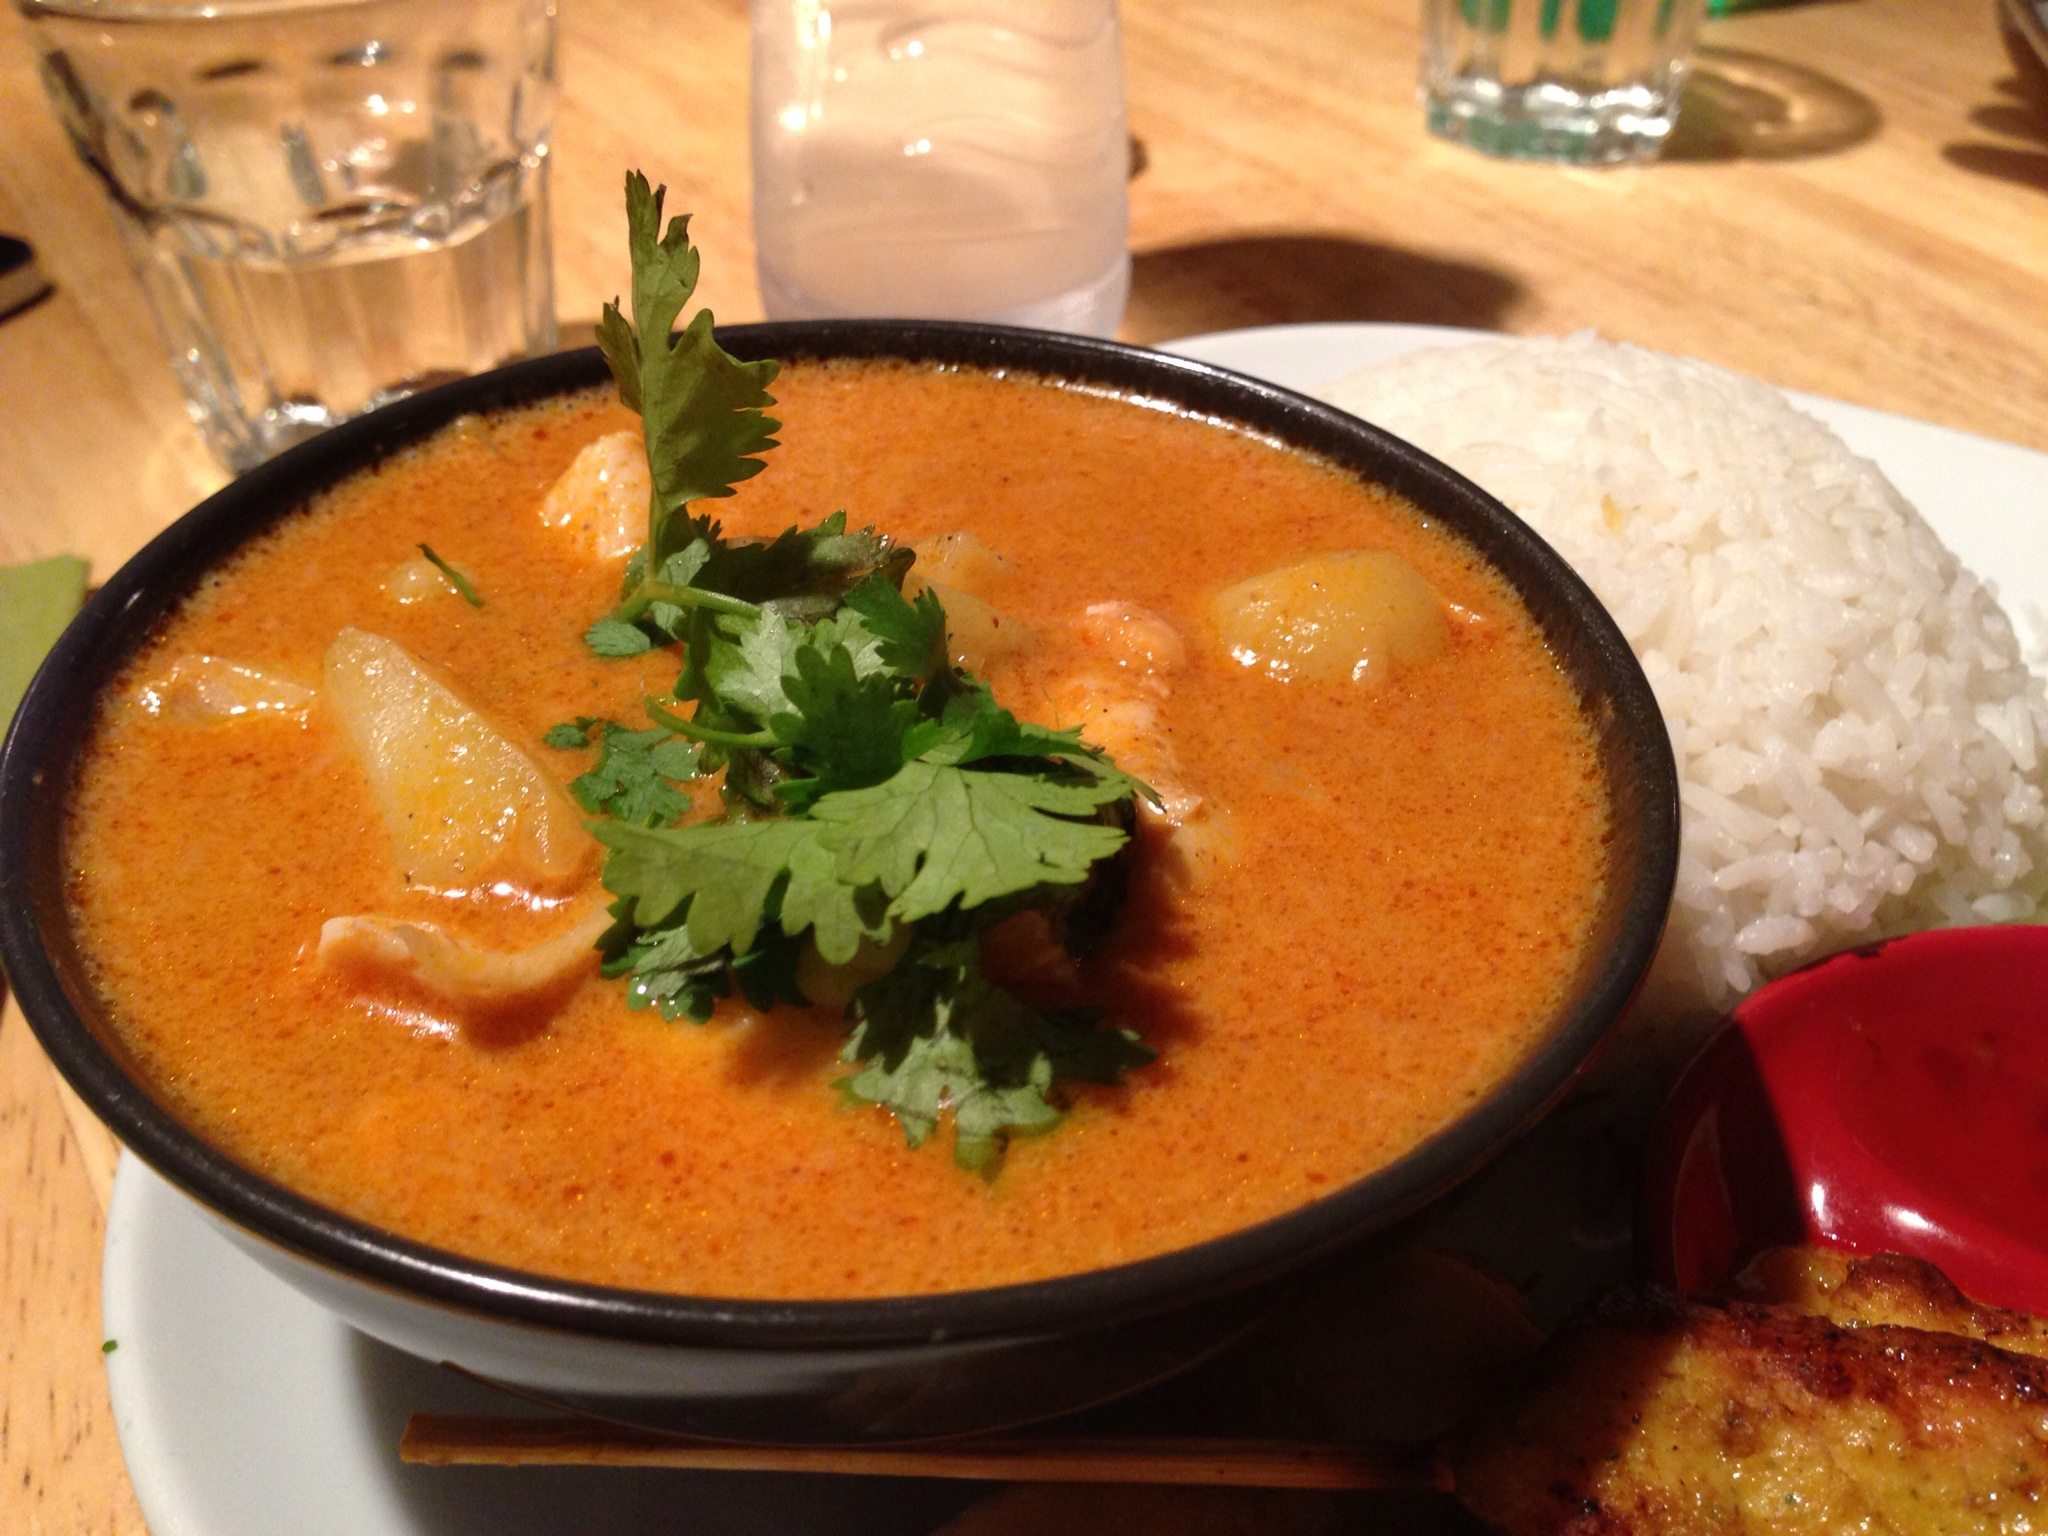 Gaeng massaman curry at CJ's cafe Acton